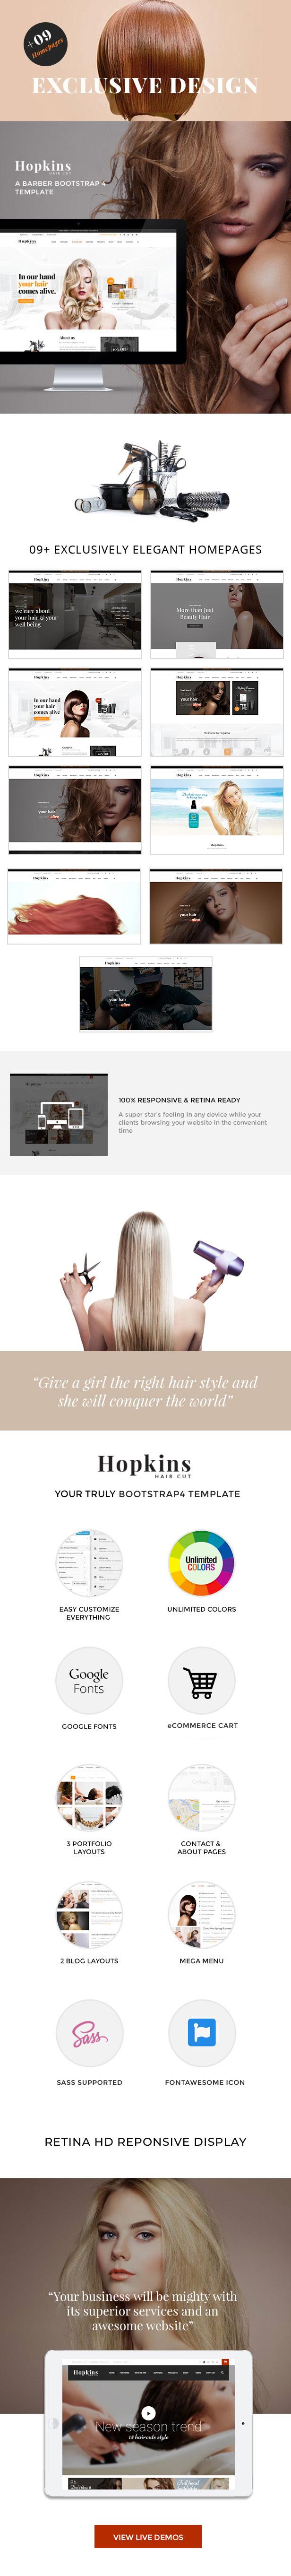 Barber Shop & Hair Salon HTML - Hopkins